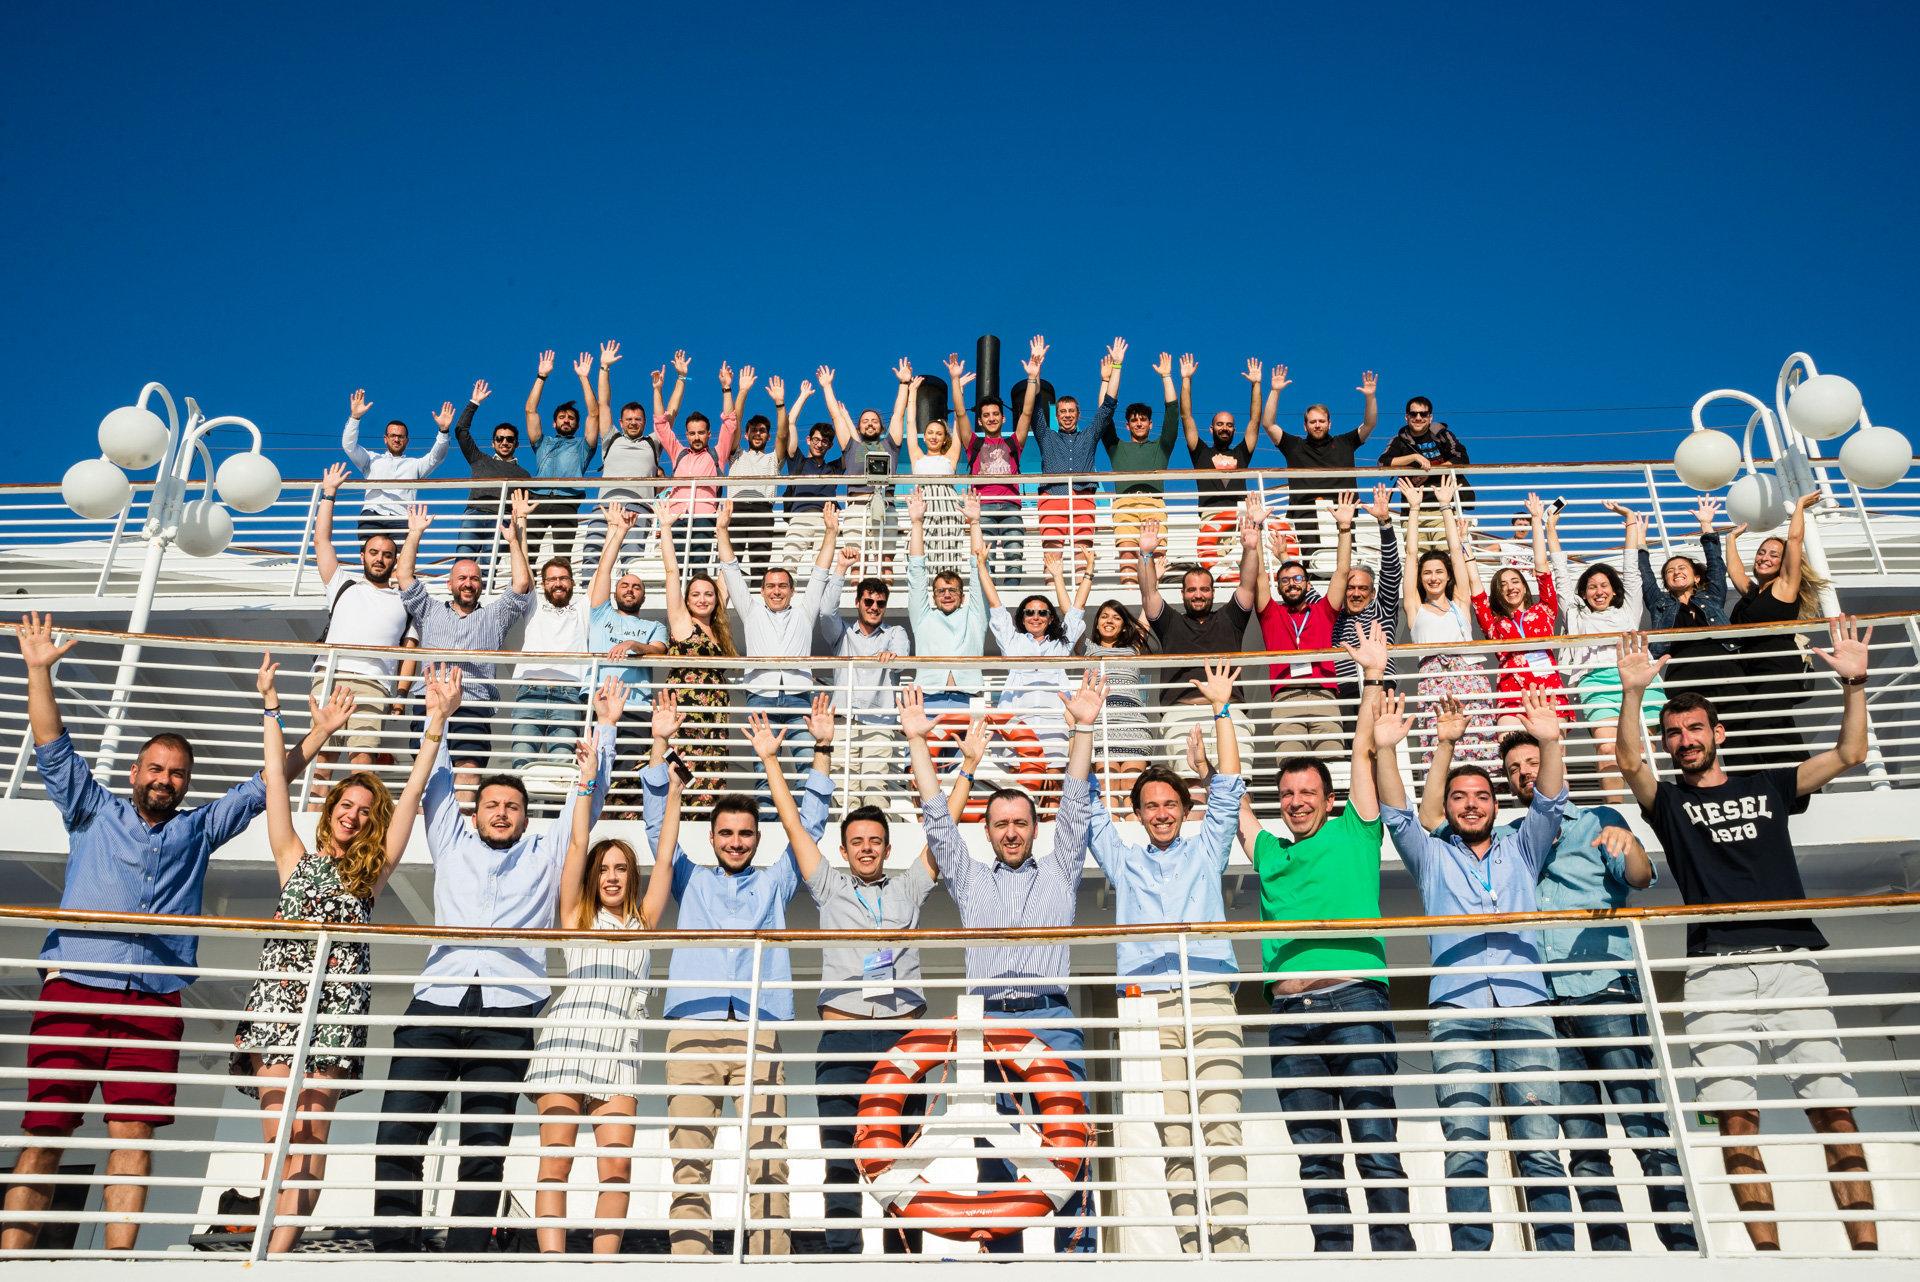 CruiseInn-Celestyal Cruises: Ολοκληρώθηκε με επιτυχία η μοναδική κρουαζιέρα επιχειρηματικότητας στην Ελλάδα, αναδεικνύοντας 2...